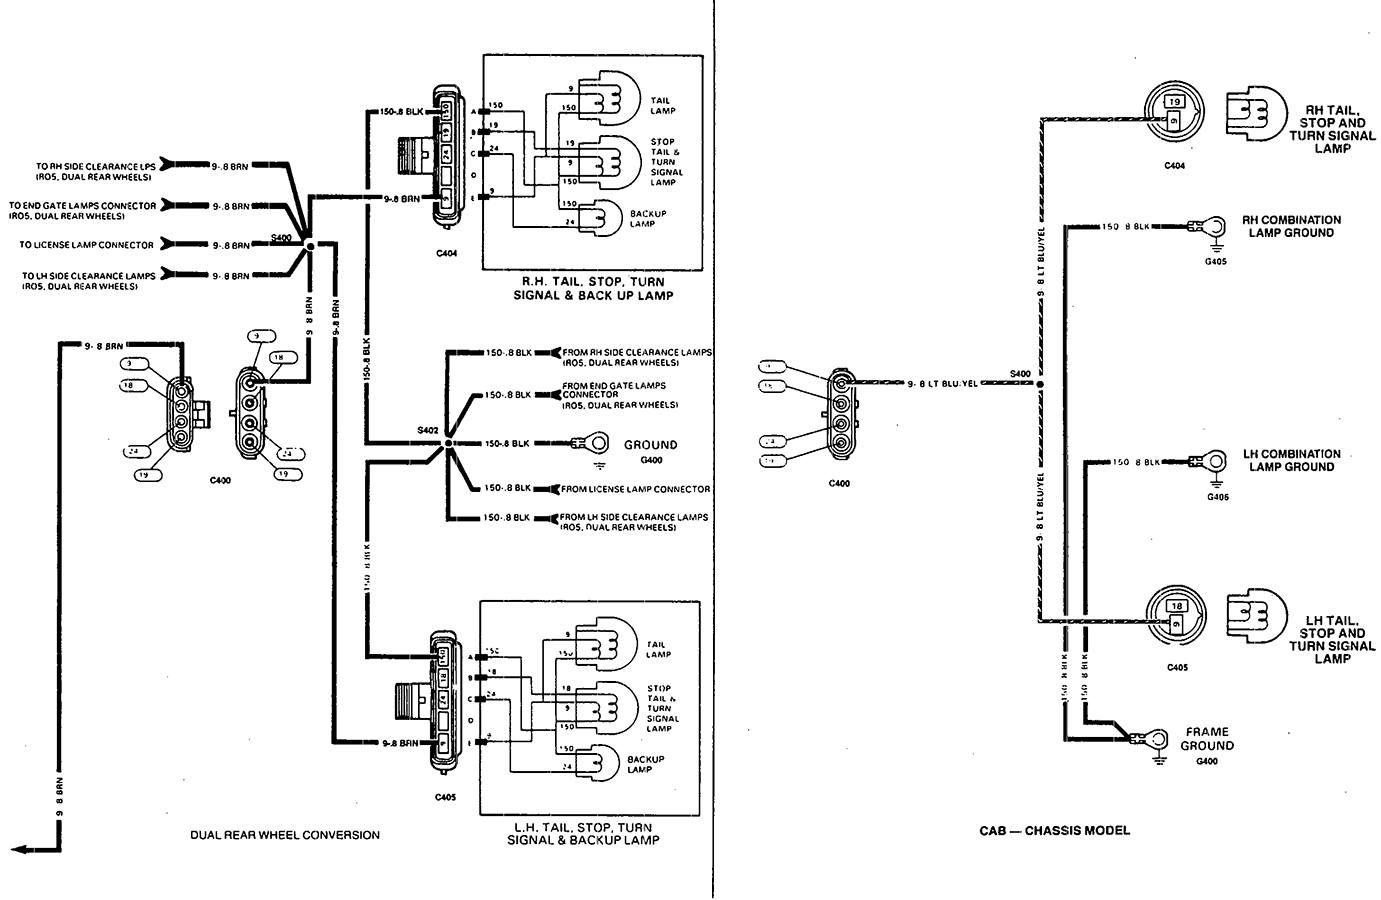 Wiring Diagram For Trailer Light Trailer wiring diagram